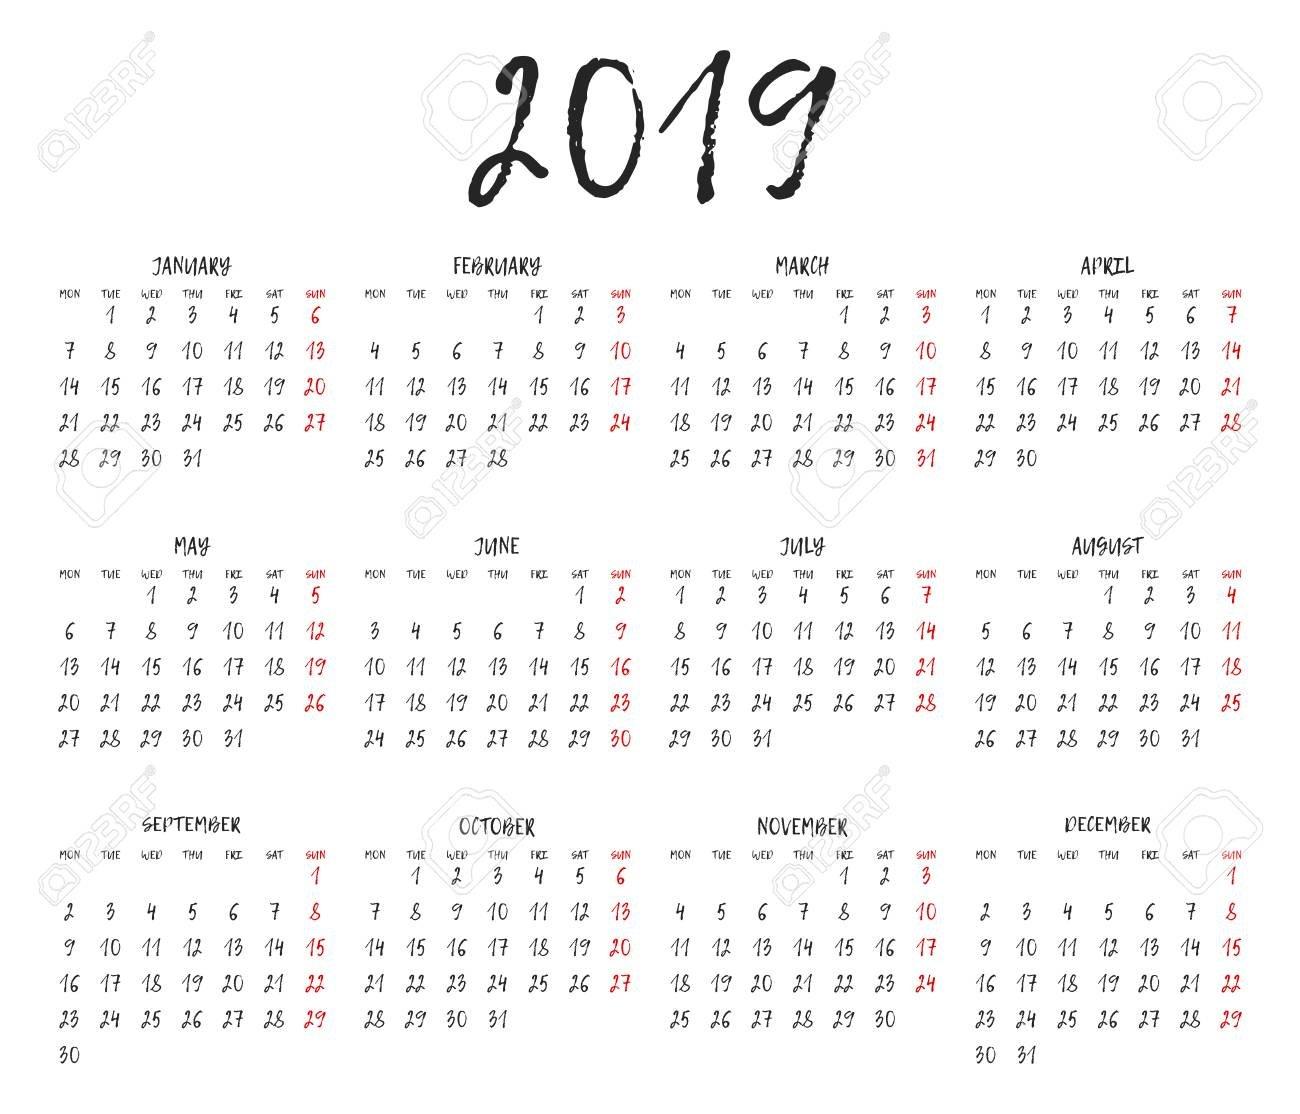 Simple Calendar Grid For 2019. Calendar Template. Week Starts Monday Calendar Week 10 2019